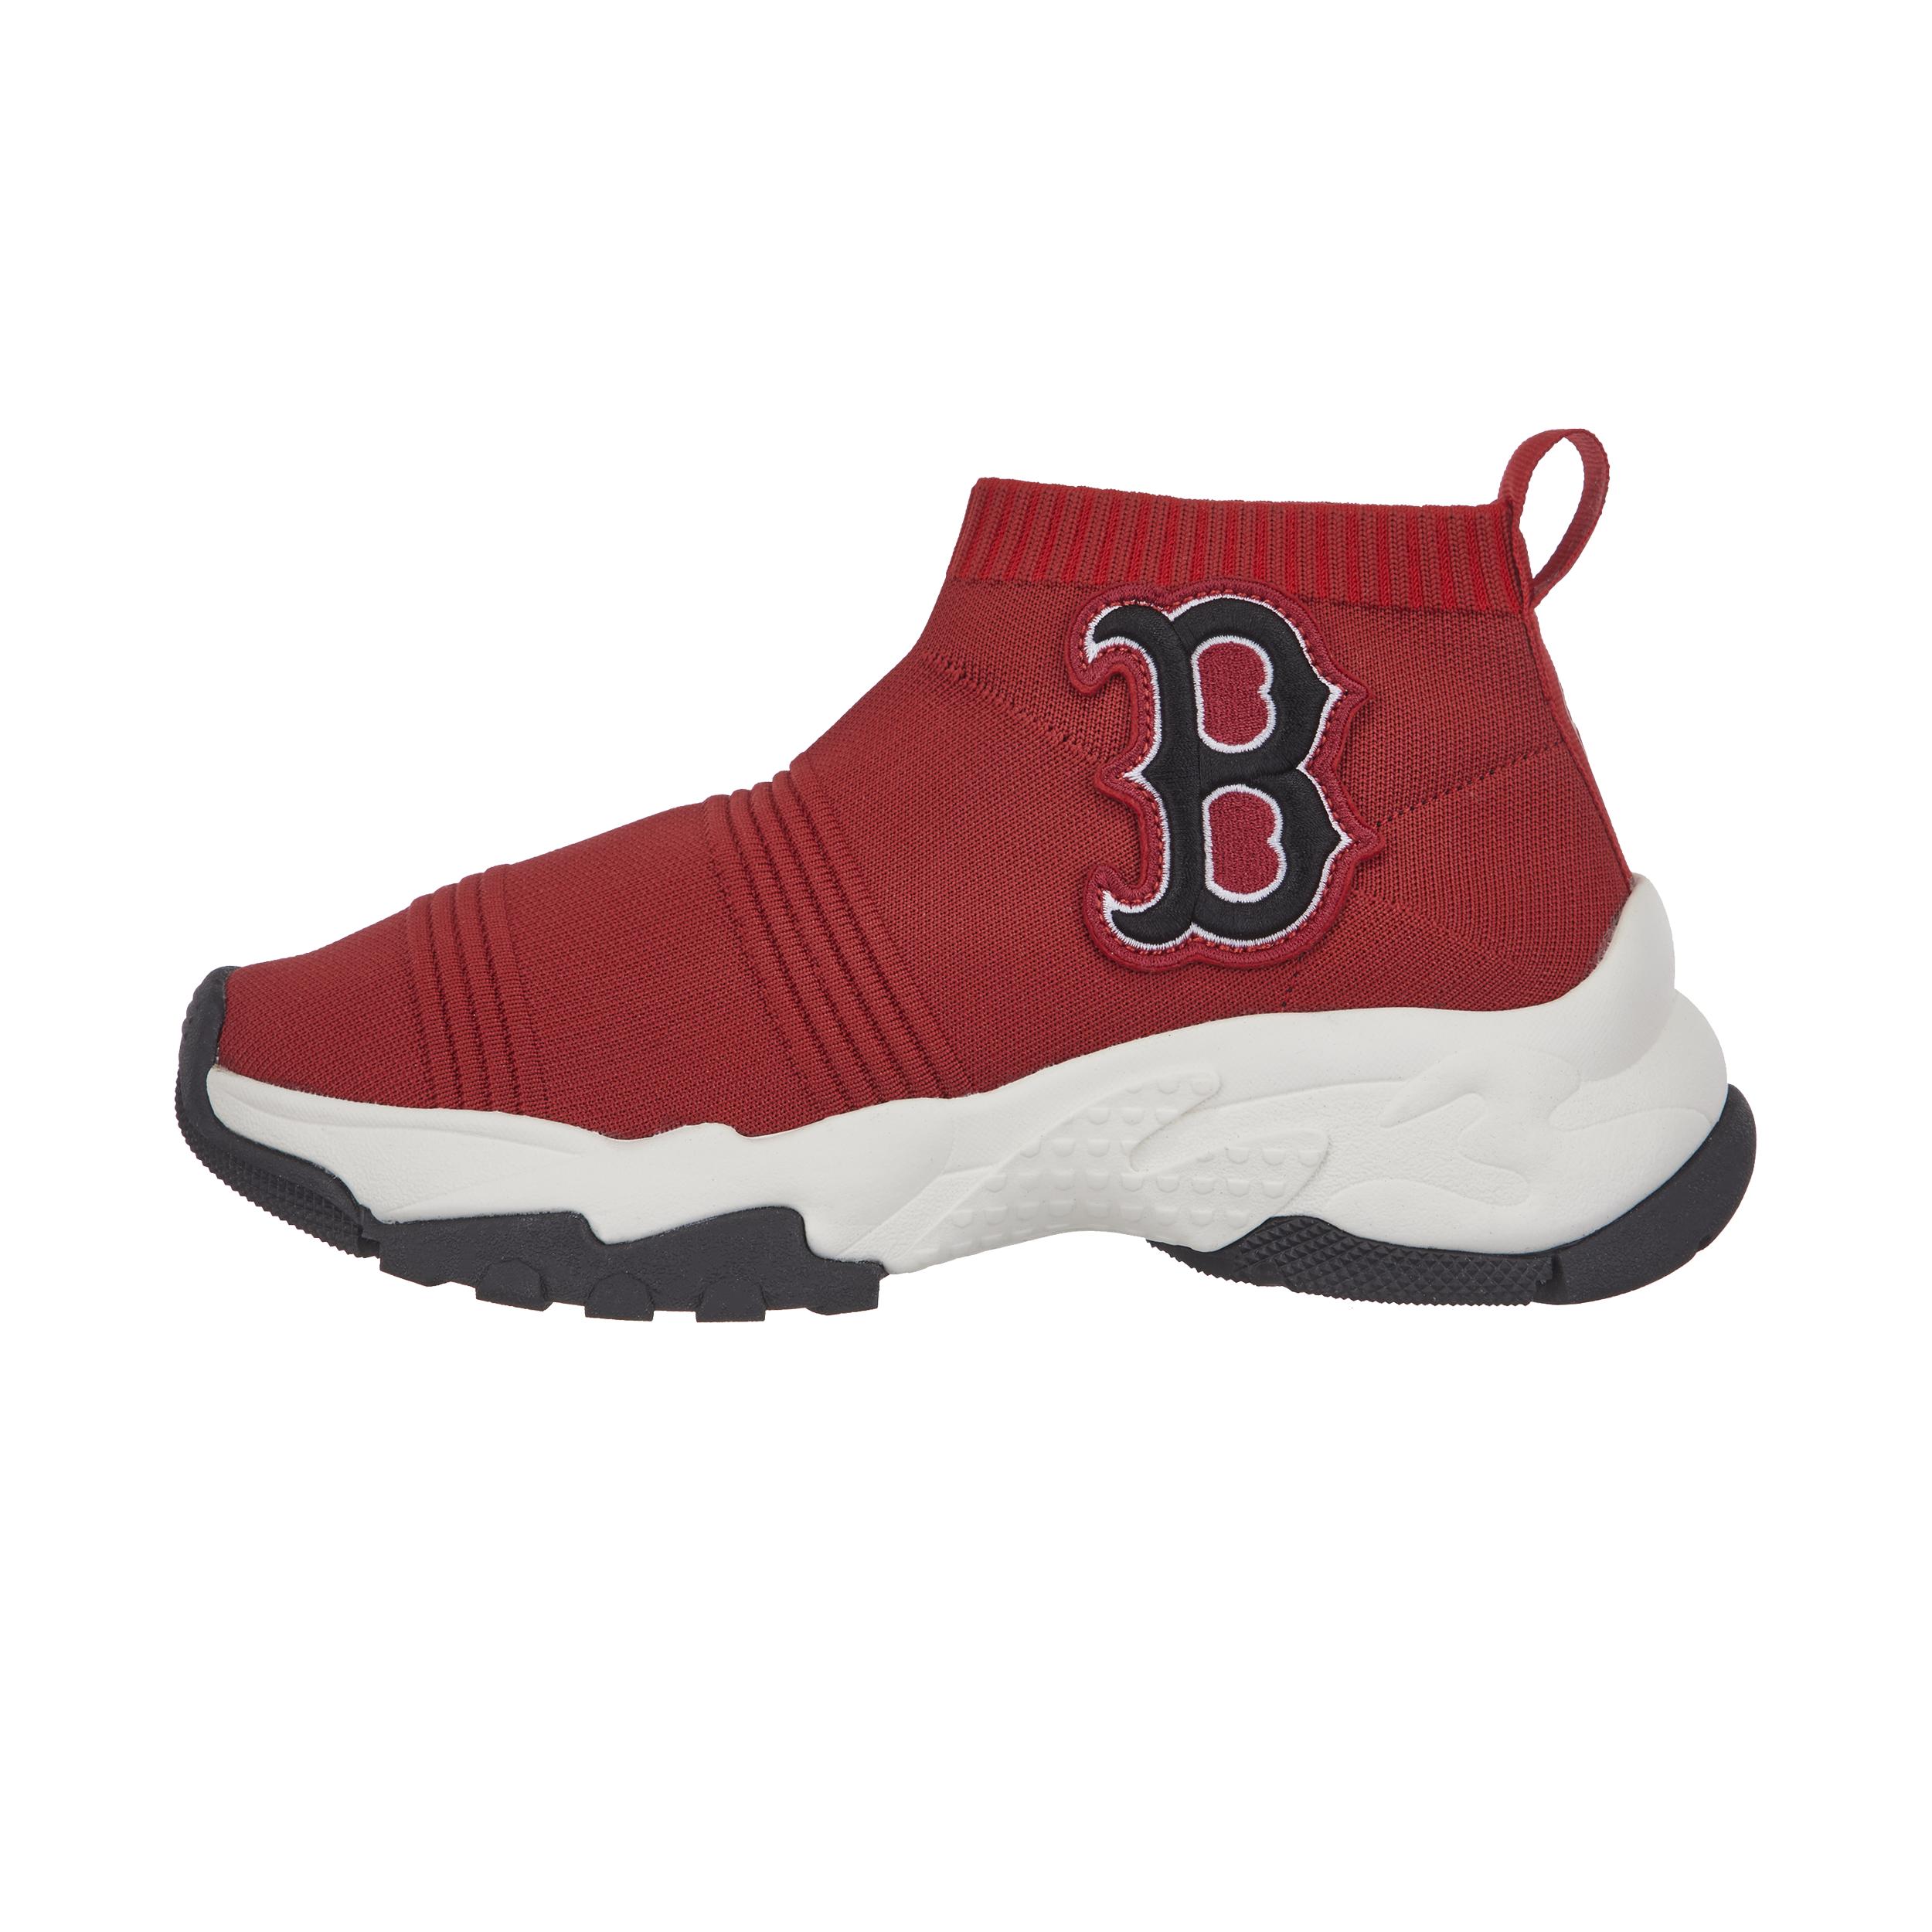 BOSTON RED SOX SNEAKERS - BIG BALL SOCKS